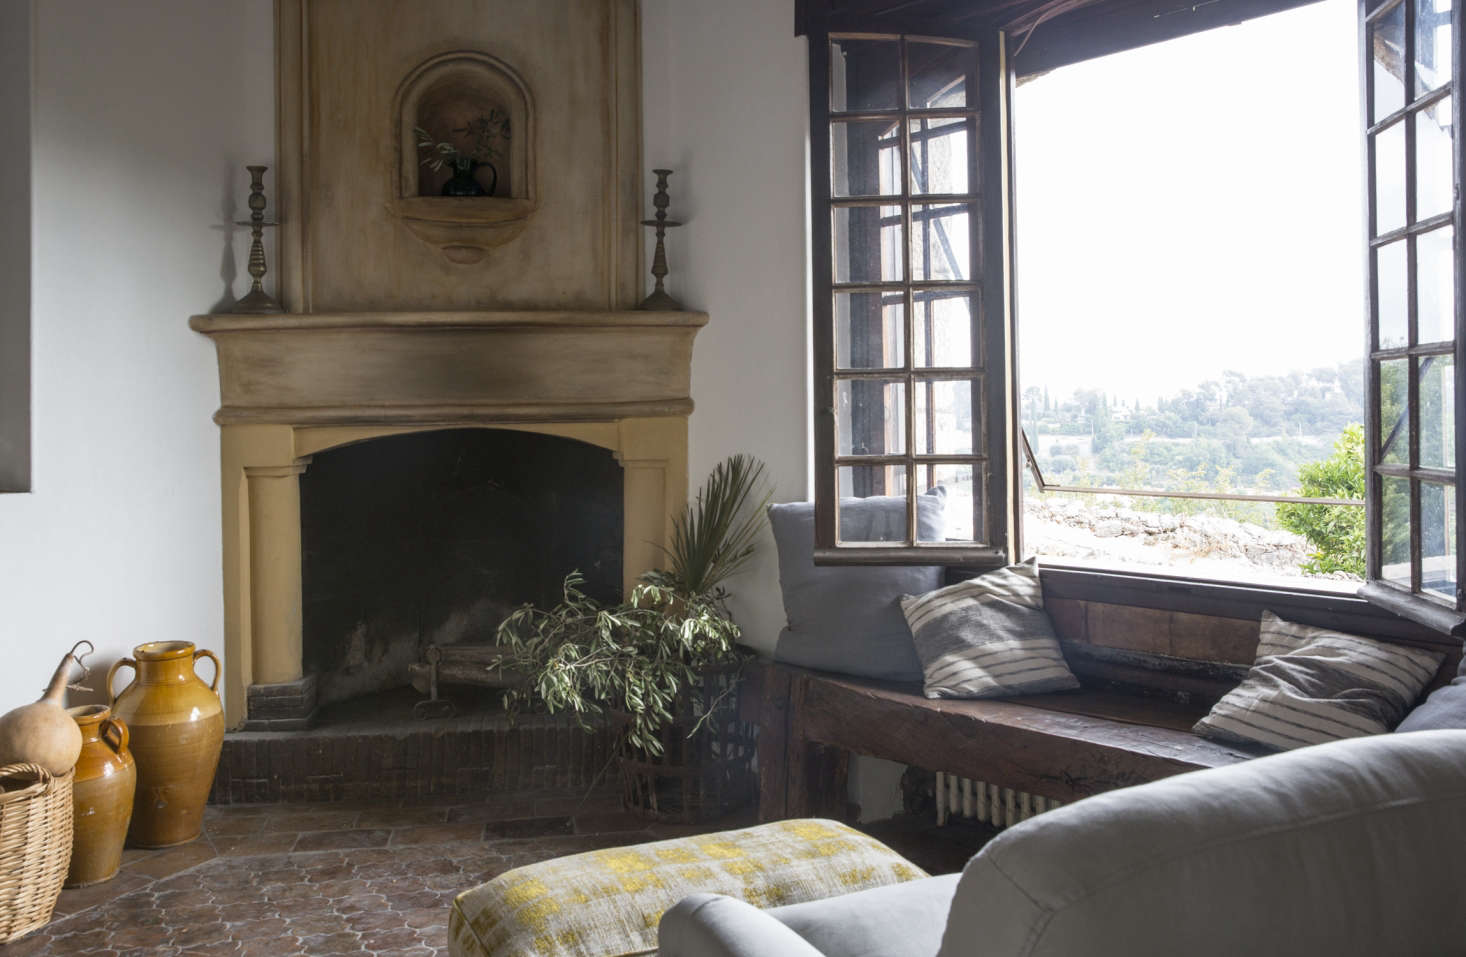 la vie en rose a 12th century poet 39 s villa in st paul de vence restored for modern living. Black Bedroom Furniture Sets. Home Design Ideas